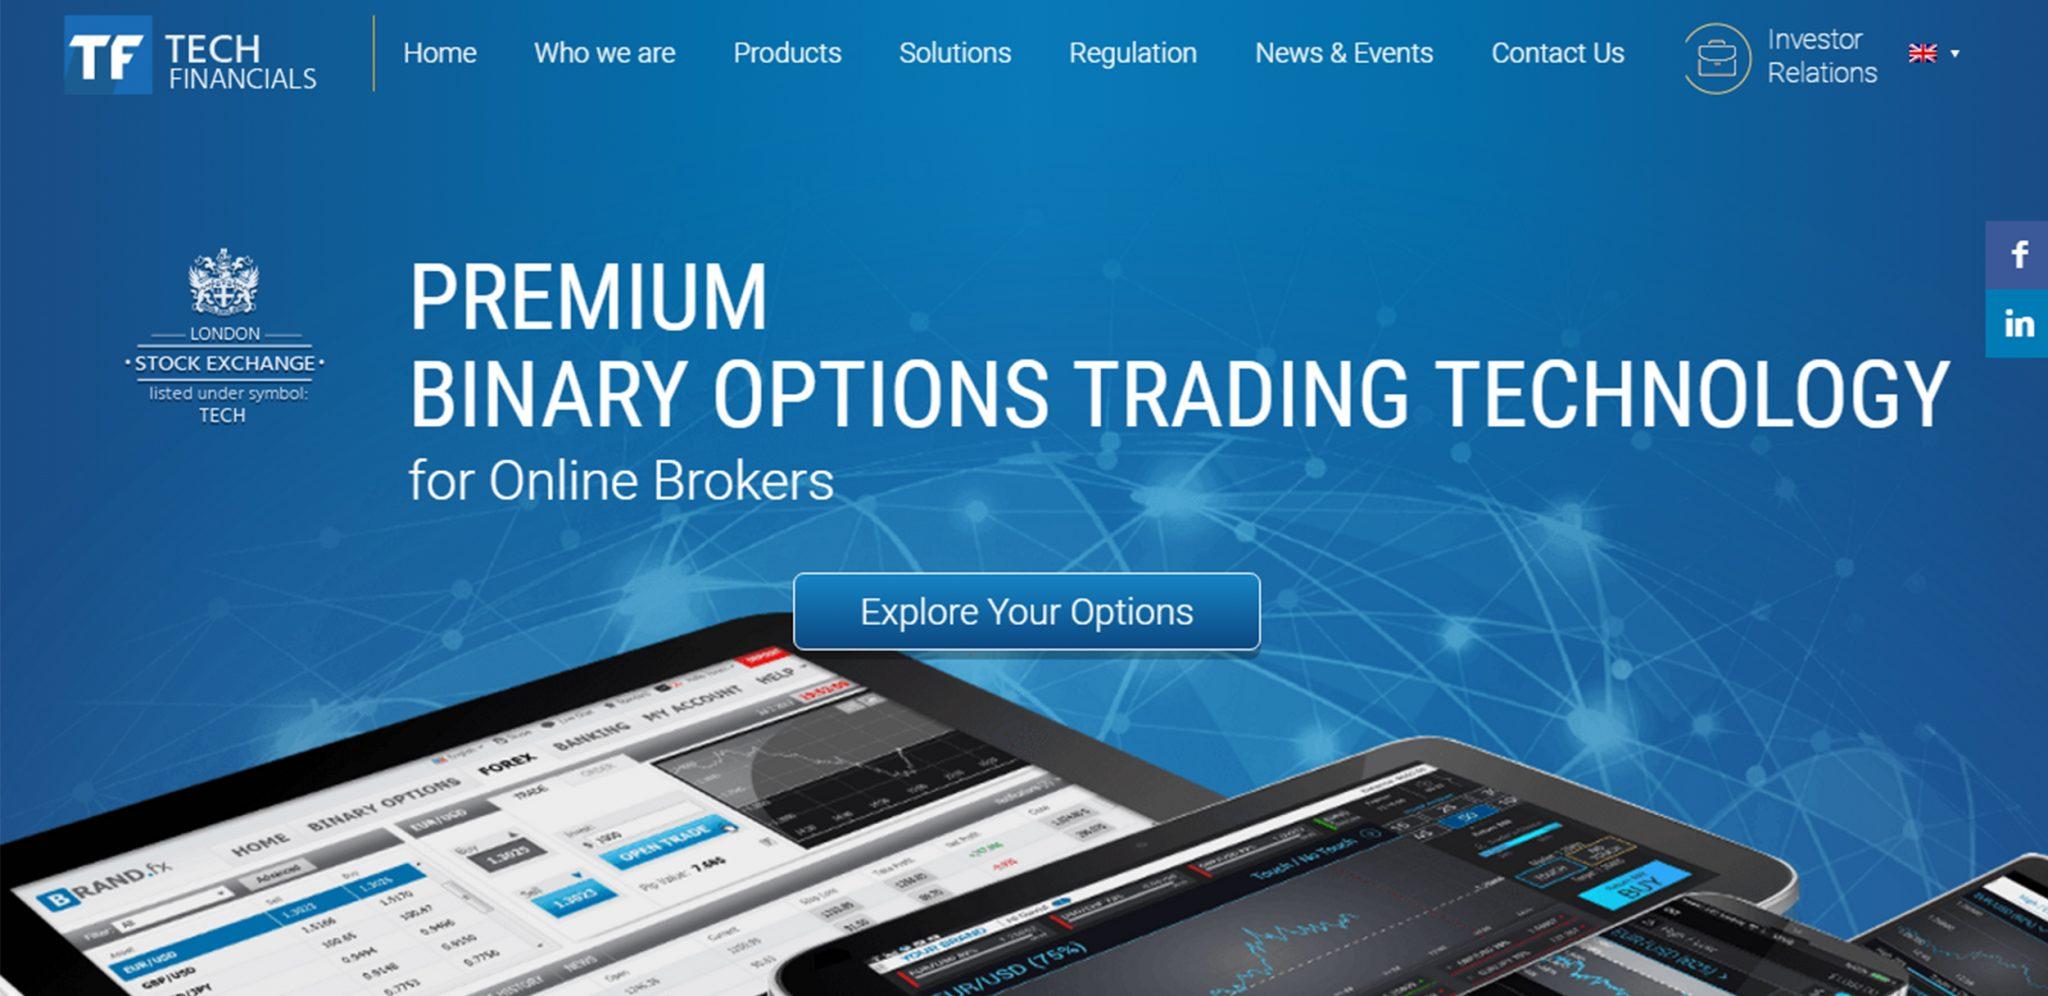 Сайт TechFinancials